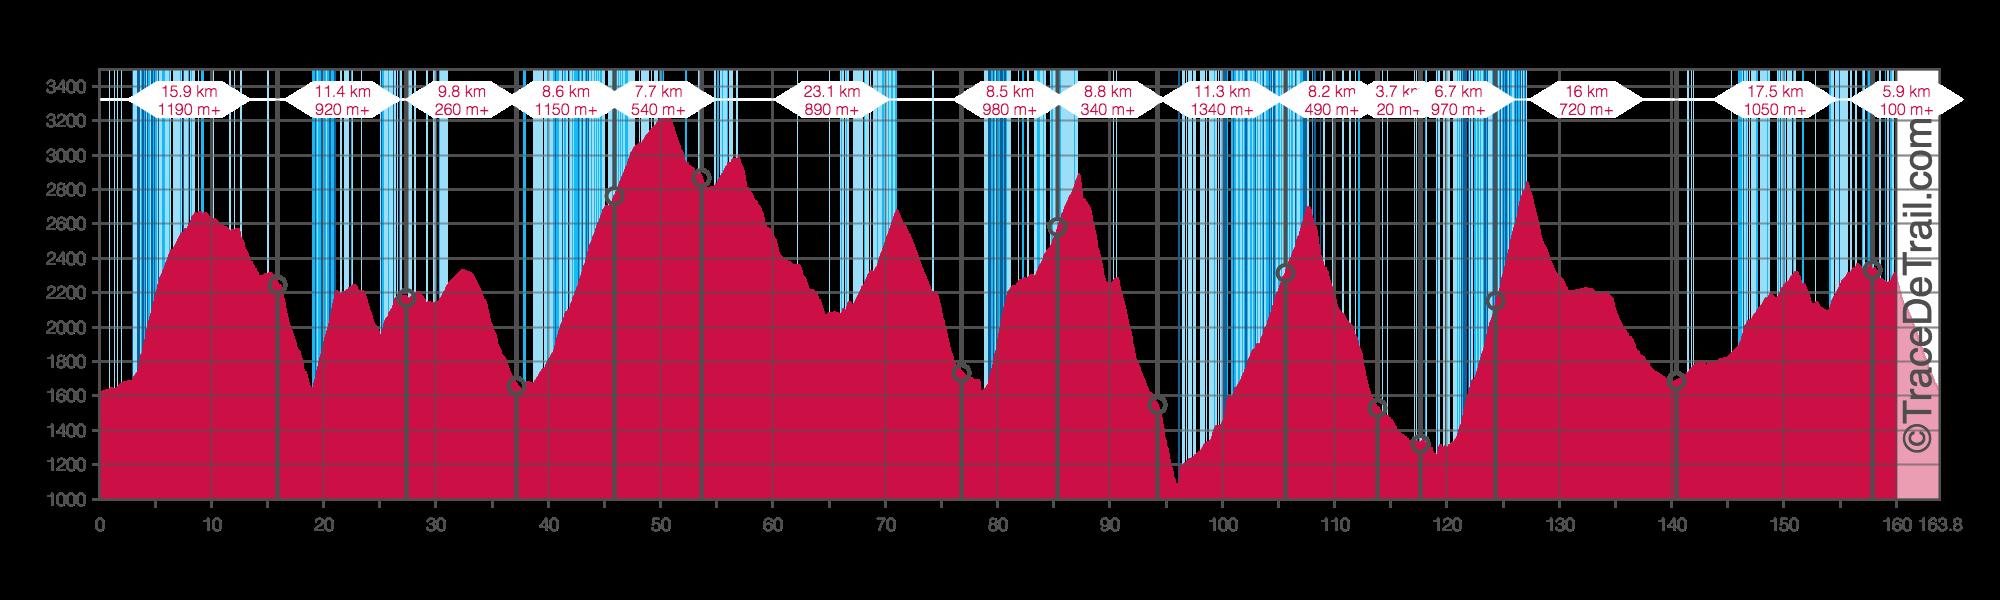 tour-de-monte-rosa-altitude-profile